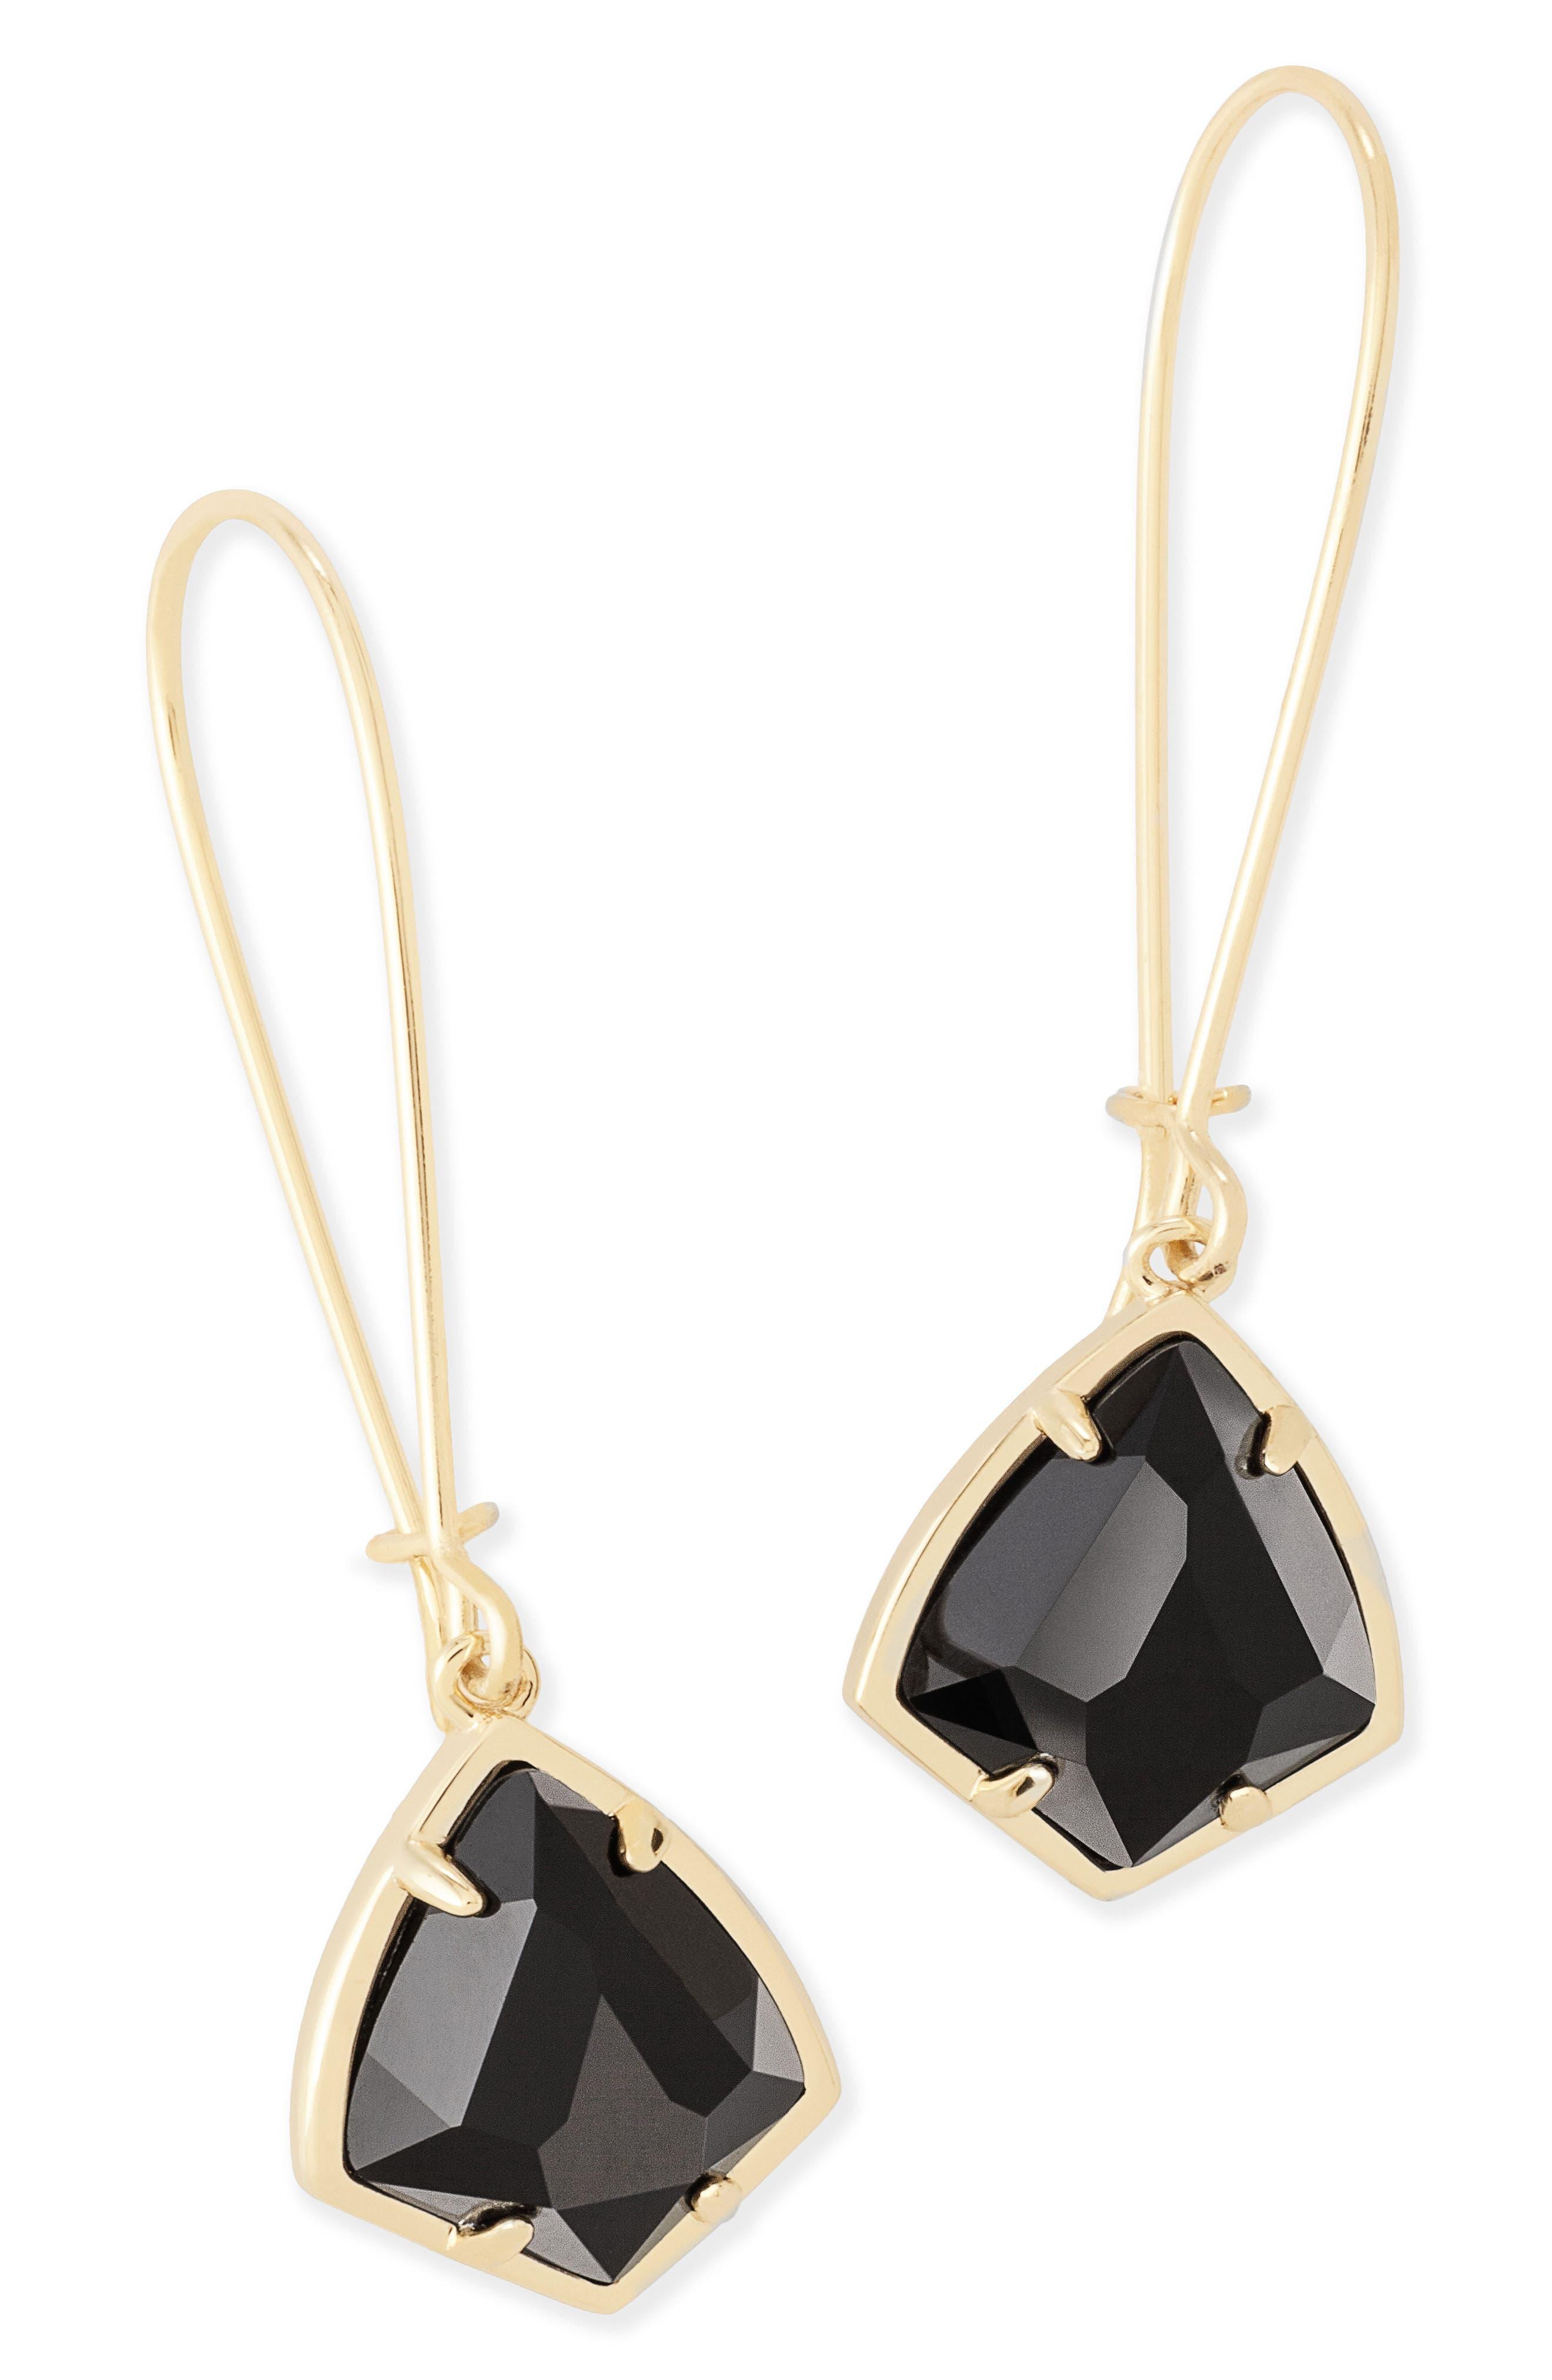 'Carrine' Semiprecious Stone Drop Earrings,                             Alternate thumbnail 2, color,                             Black/ Gold